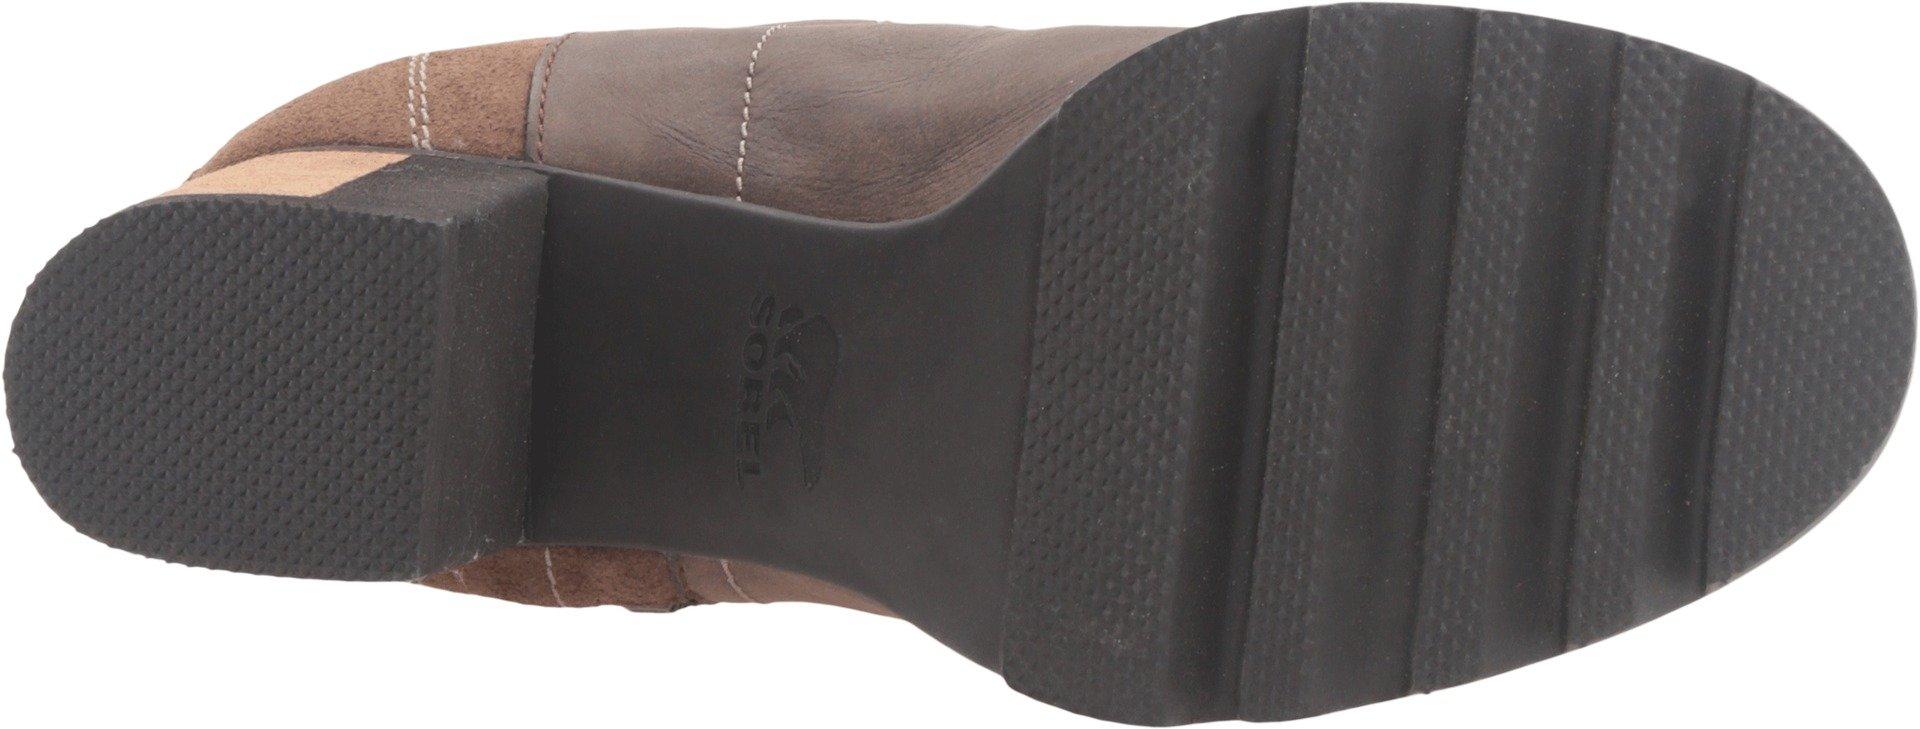 Sorel Addington Tall Boot - Women's Umber / Black 8.5 by SOREL (Image #3)